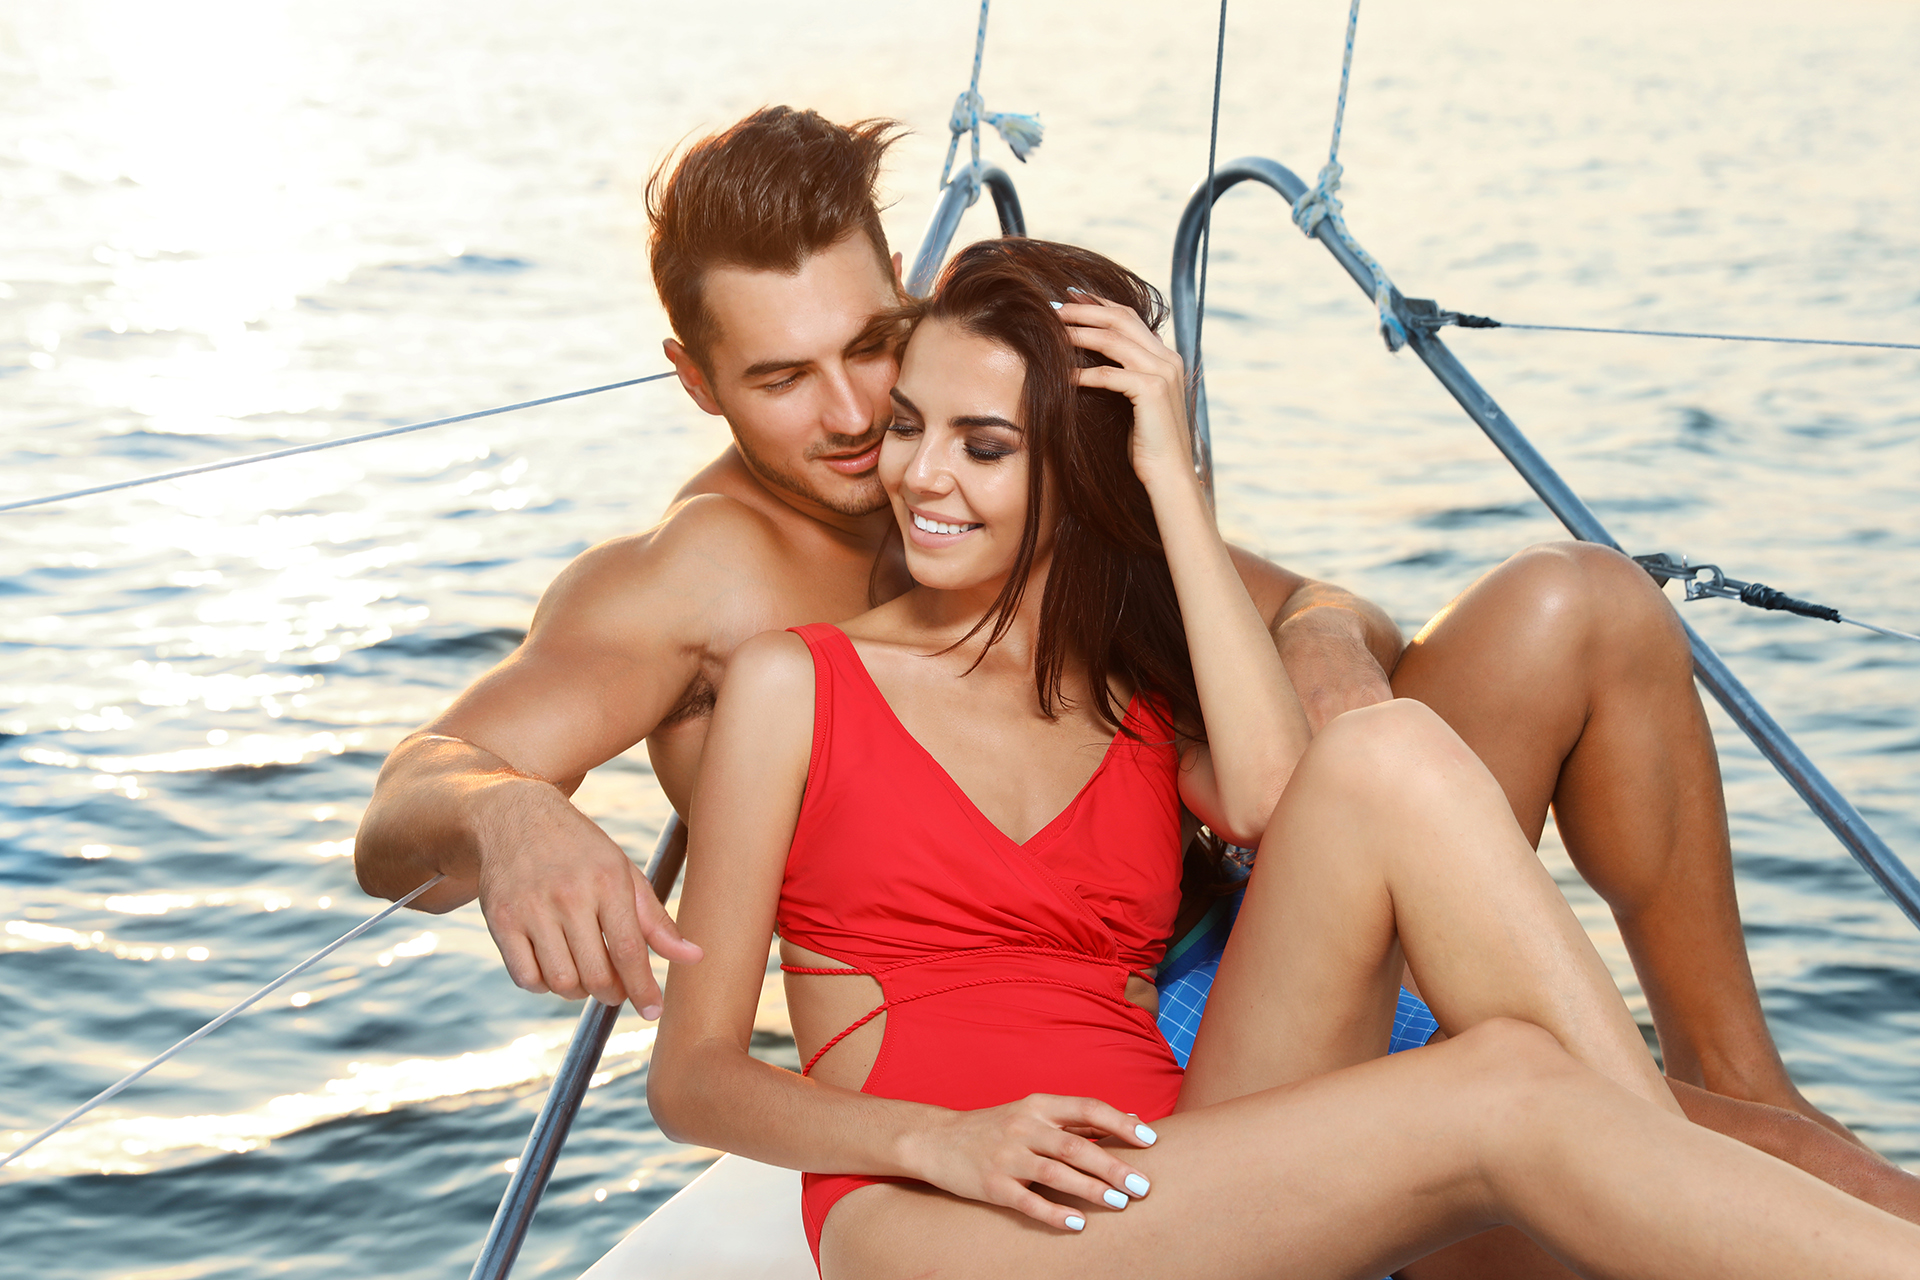 Young man and his beautiful girlfriend in bikini on yacht. Happy